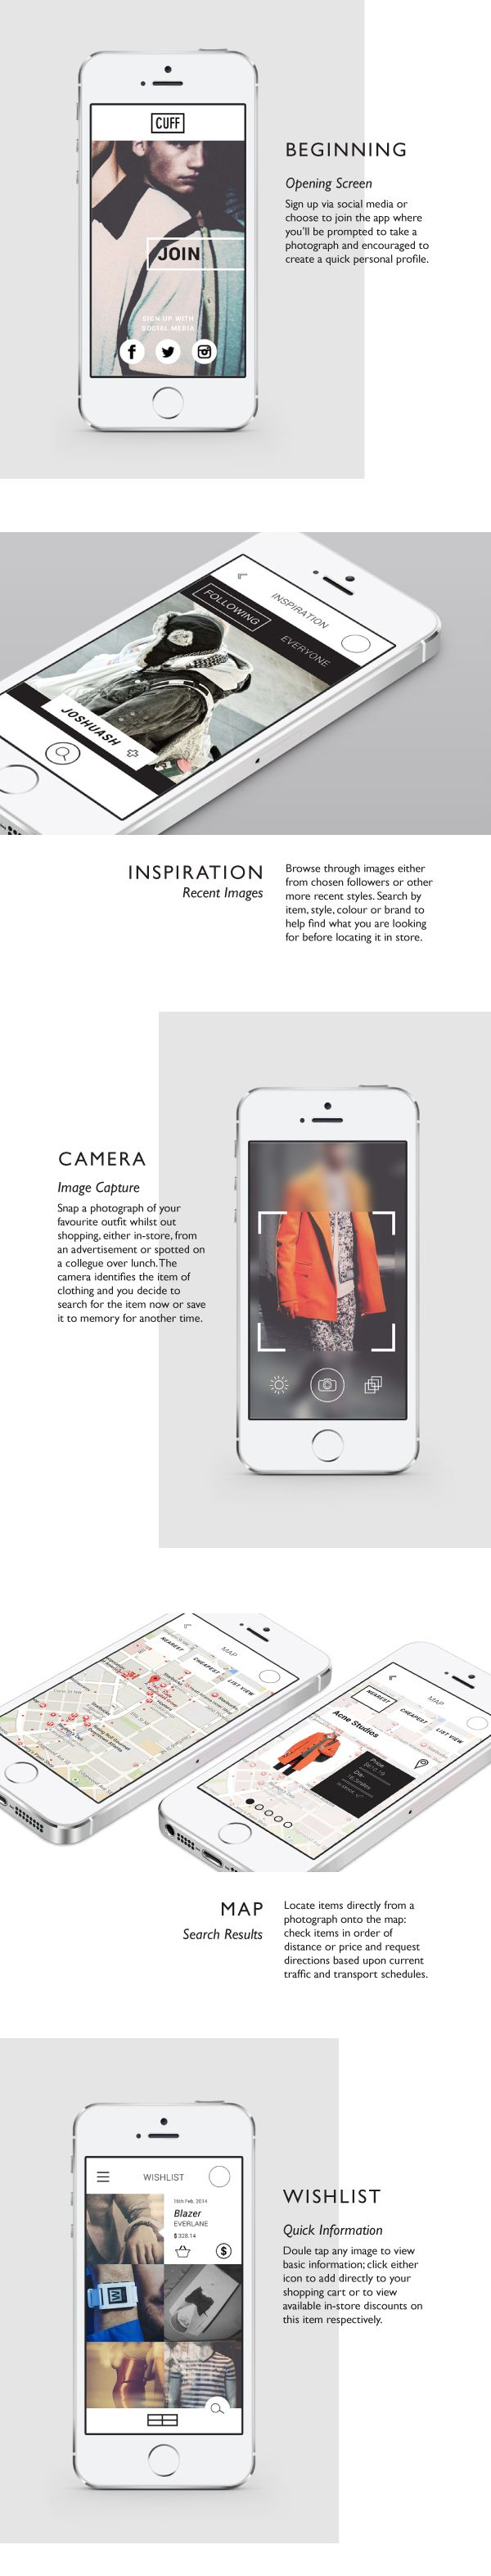 CUFF - Mobile App Concept #Buick #Rvinyl http://www.rvinyl.com/Buick-Accessories.html